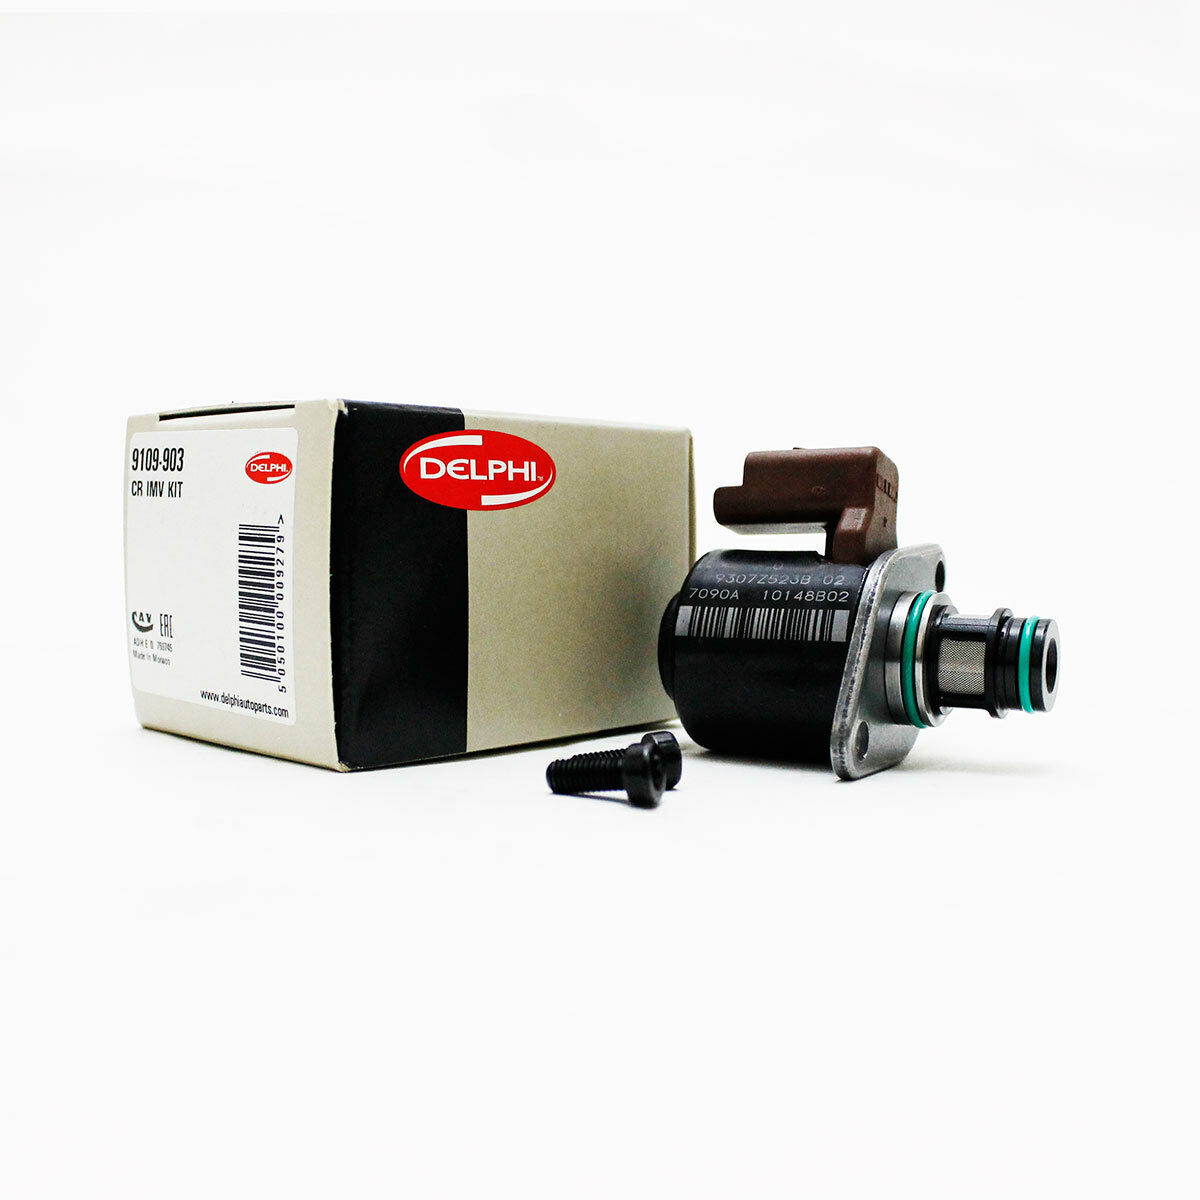 Delphi 9109-927 Cr Inlet Metering Valve Kit